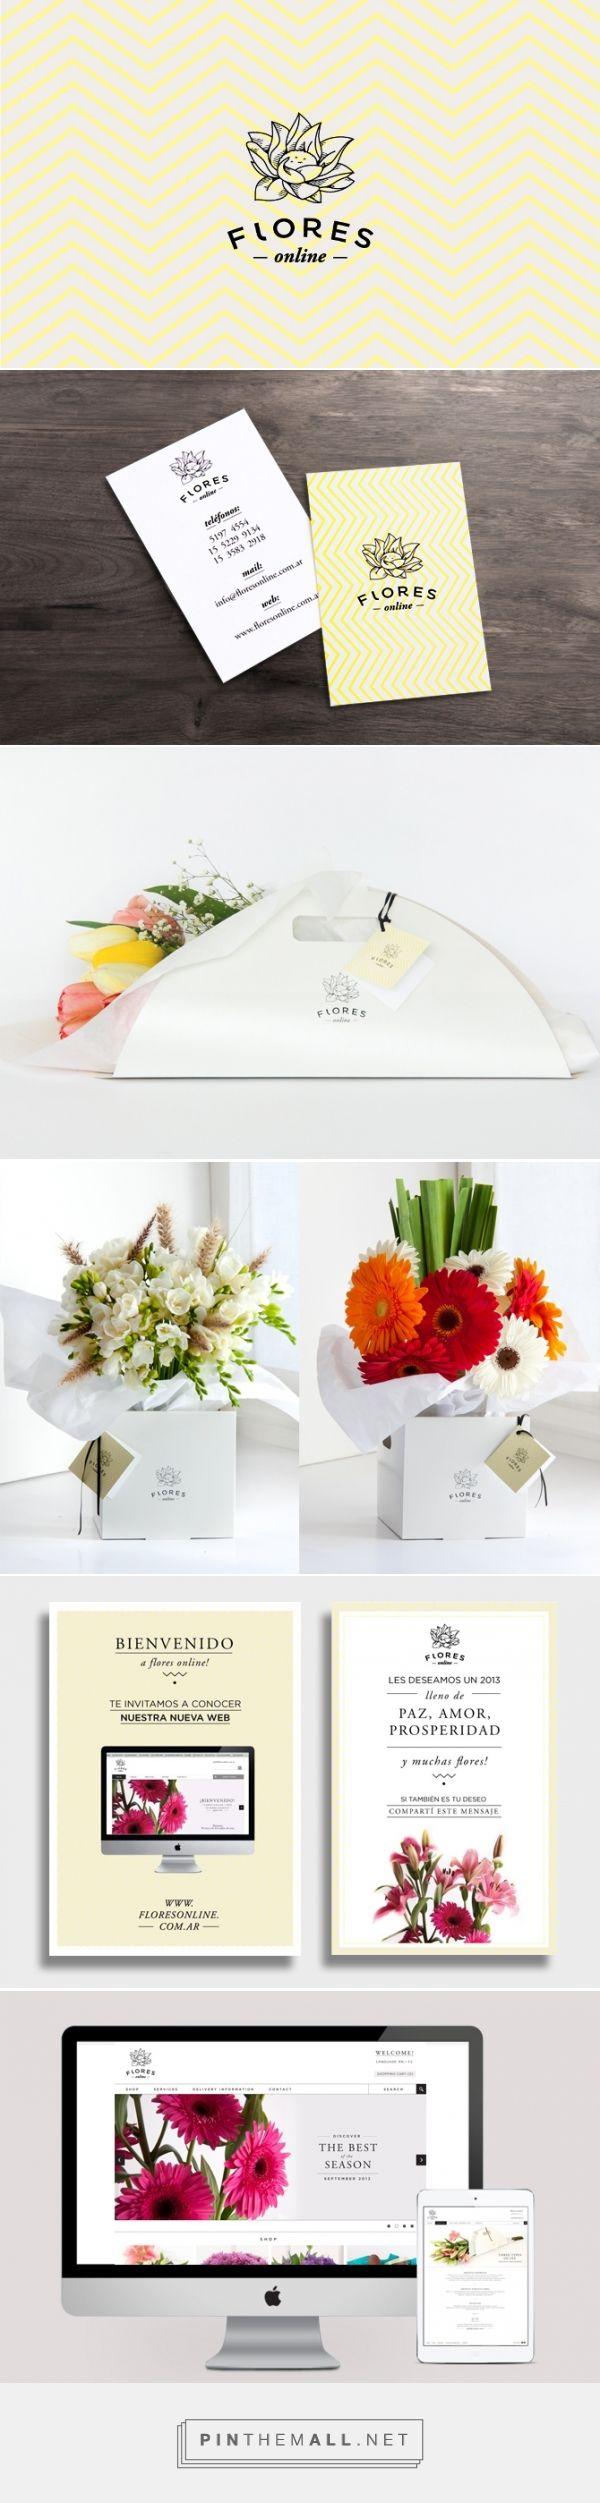 Flores Online by Belen Peralta Ramos | Fivestar Branding – Design and Branding Agency & Inspiration Gallery